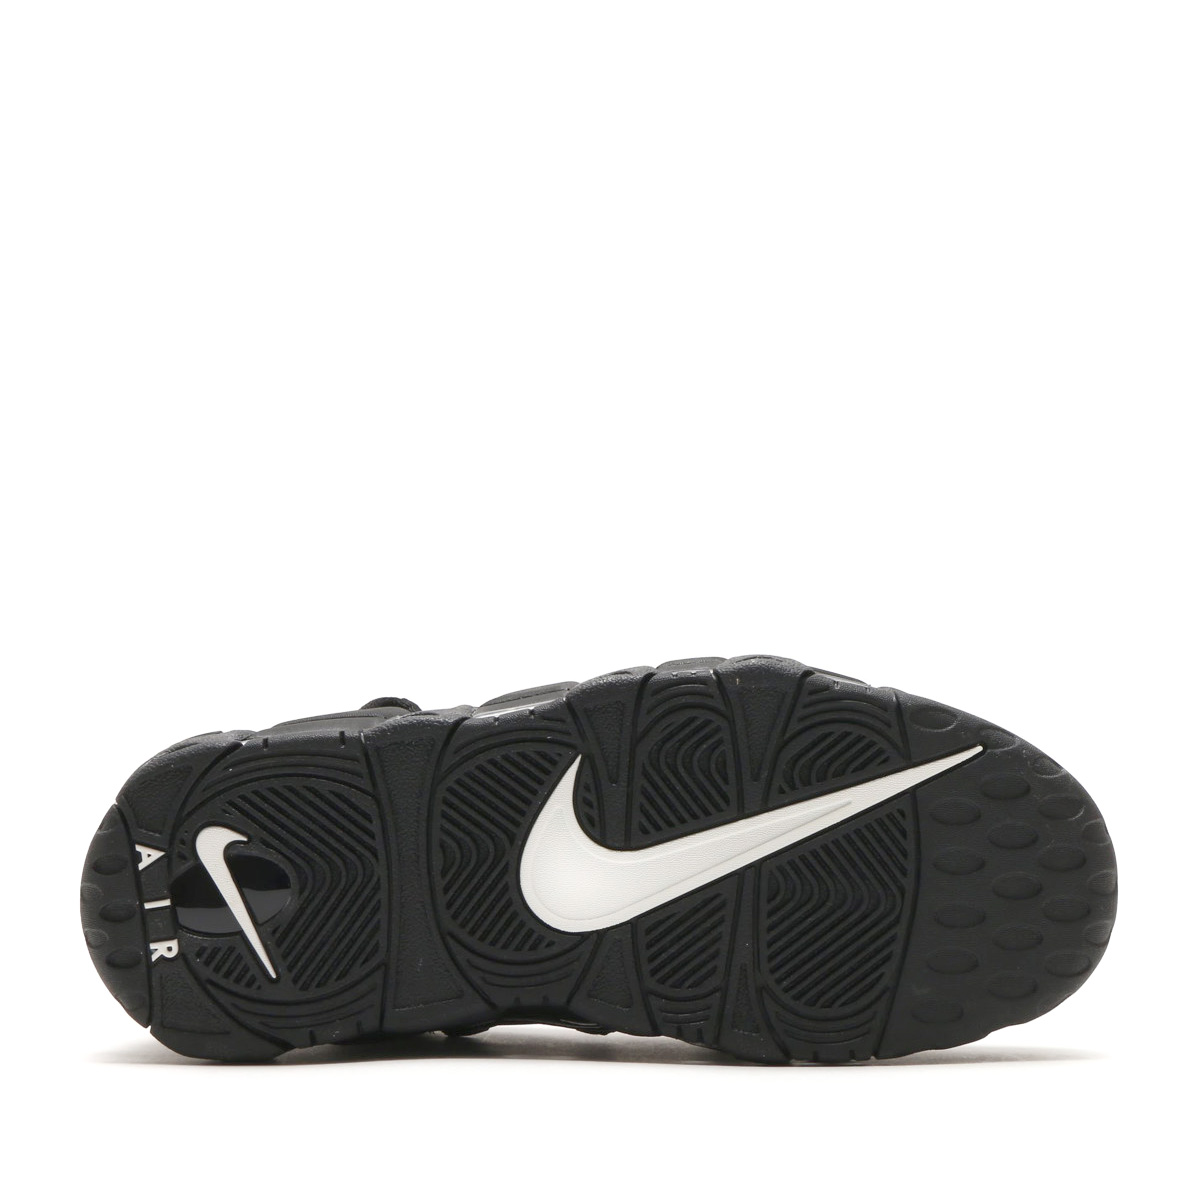 ebe79241b02072 NIKE W AIR MORE MONEY LX (Nike women air more money LX) (BLACK BLACK-SUMMIT  WHITE)18SP-S